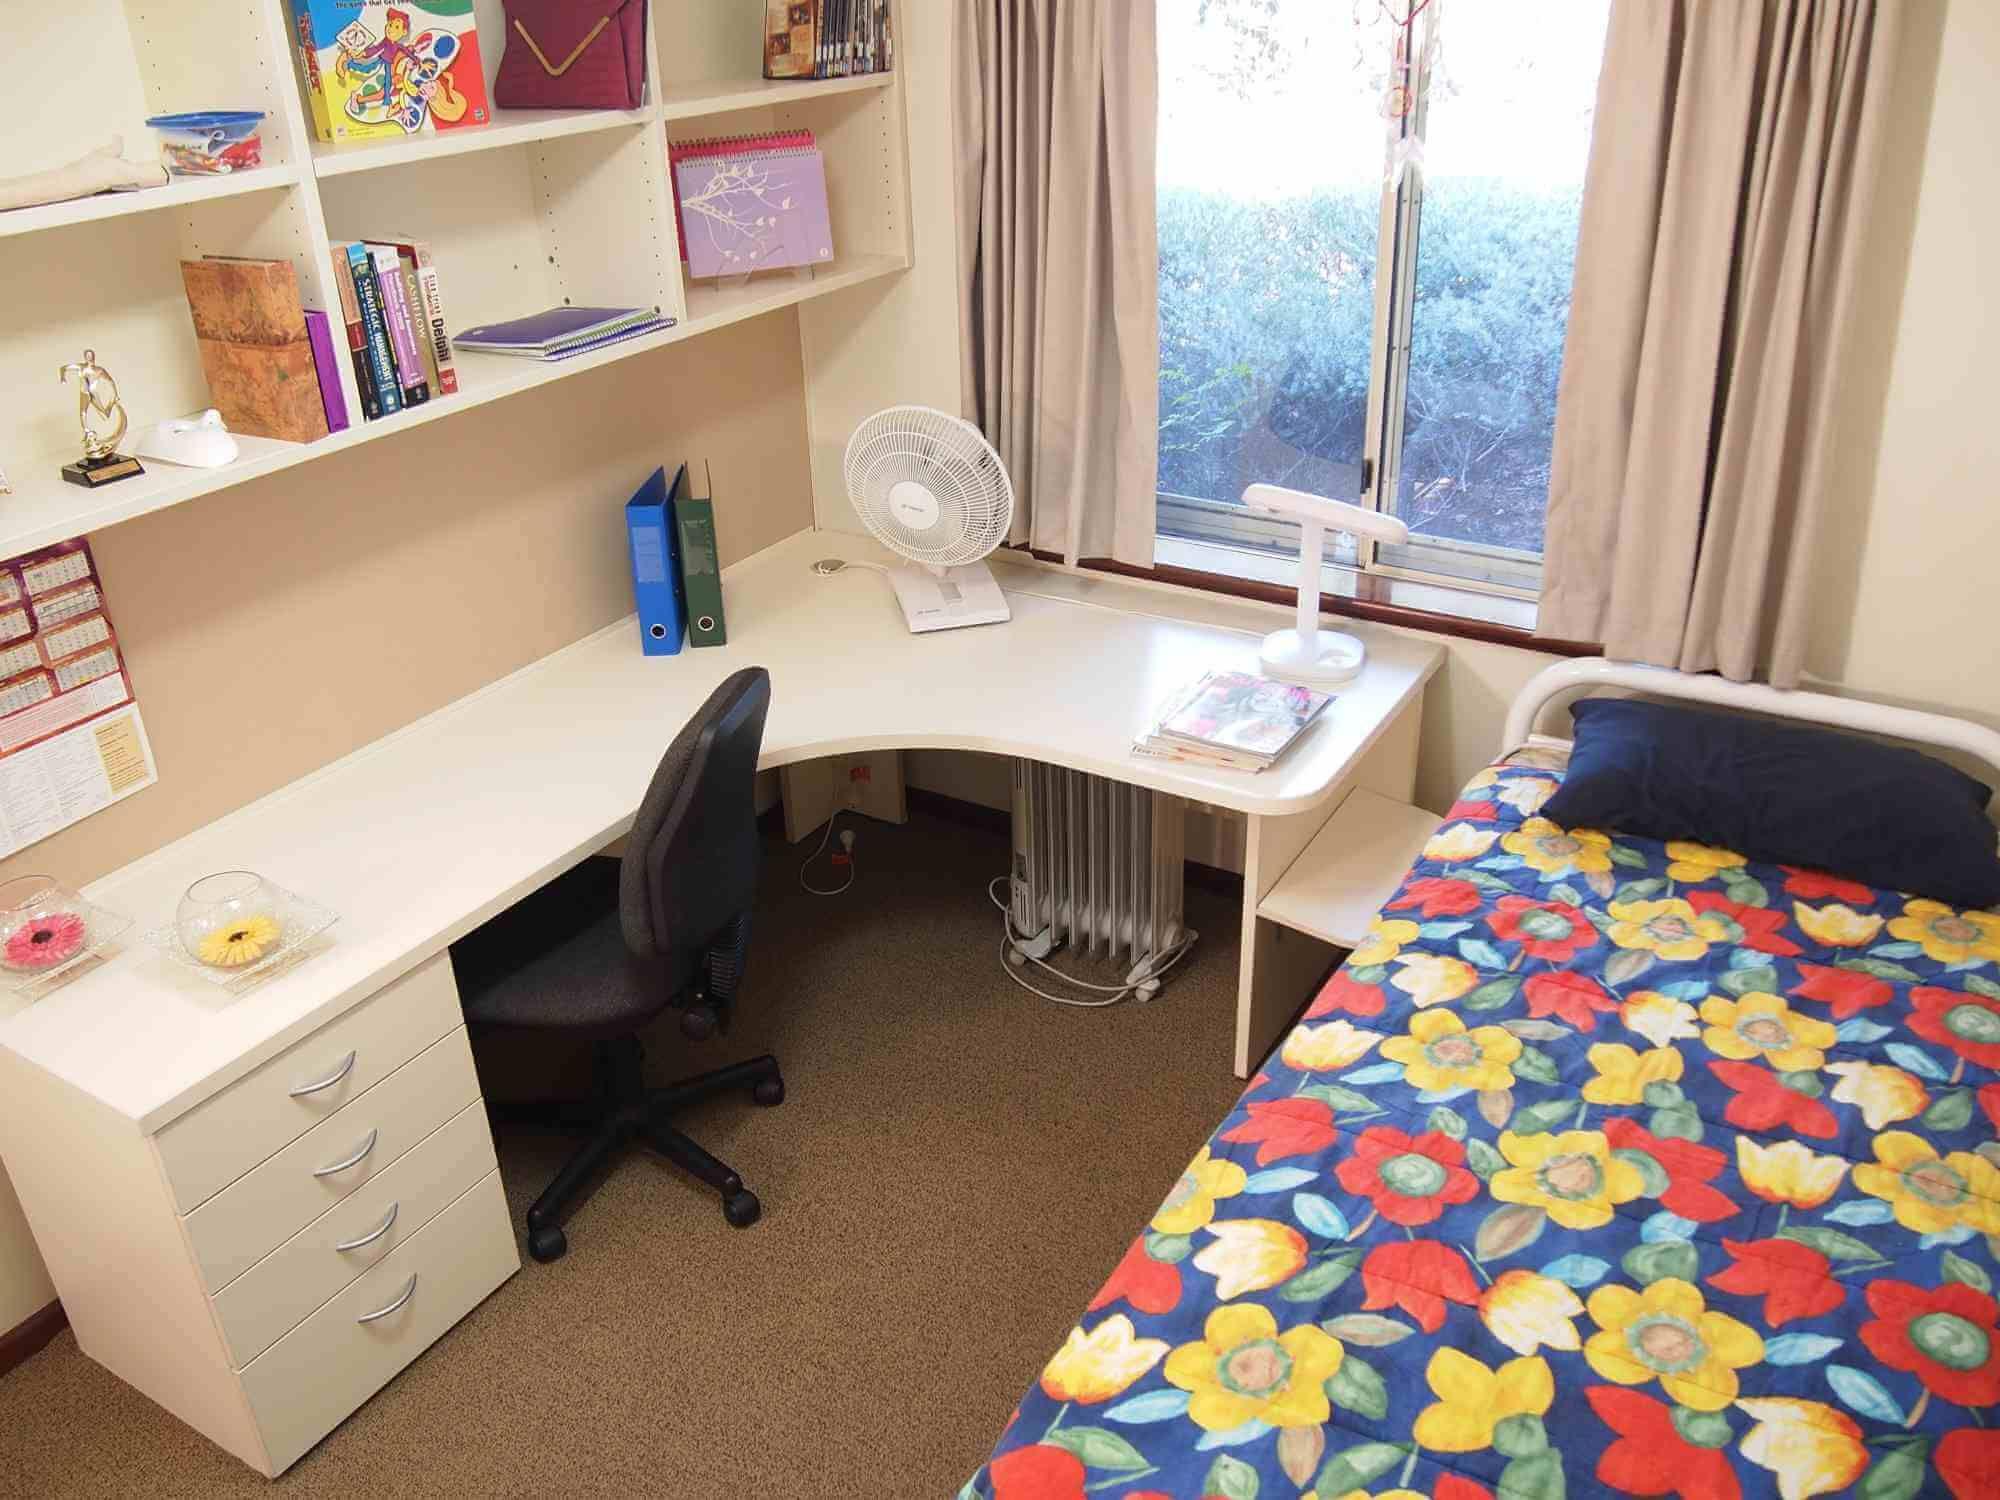 Student Rooms Near Curtin University Student Accommodation Student Room University Of Sydney